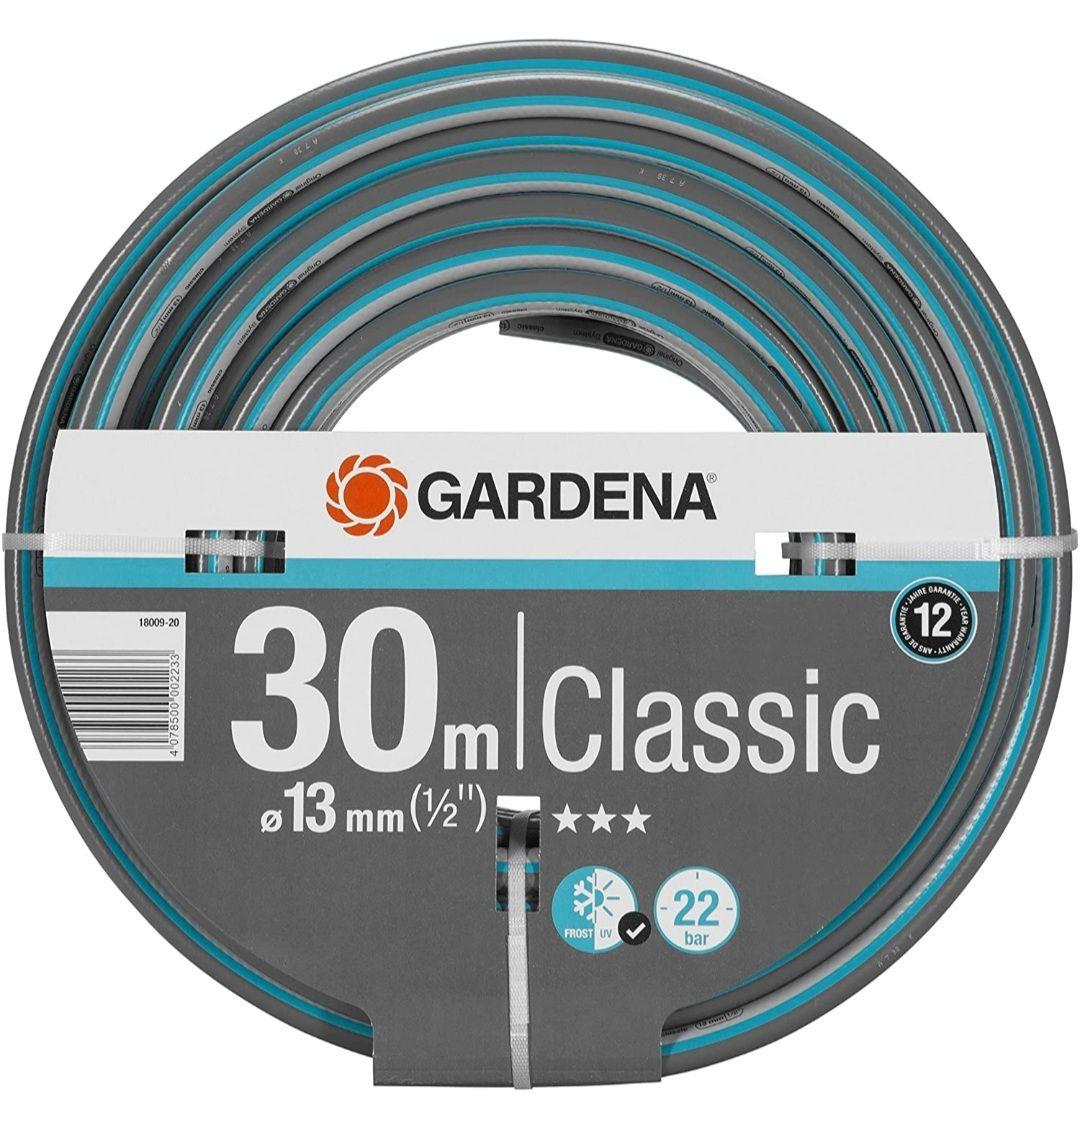 Gardena Classic Schlauch 13 mm (1/2 Zoll), 30 m